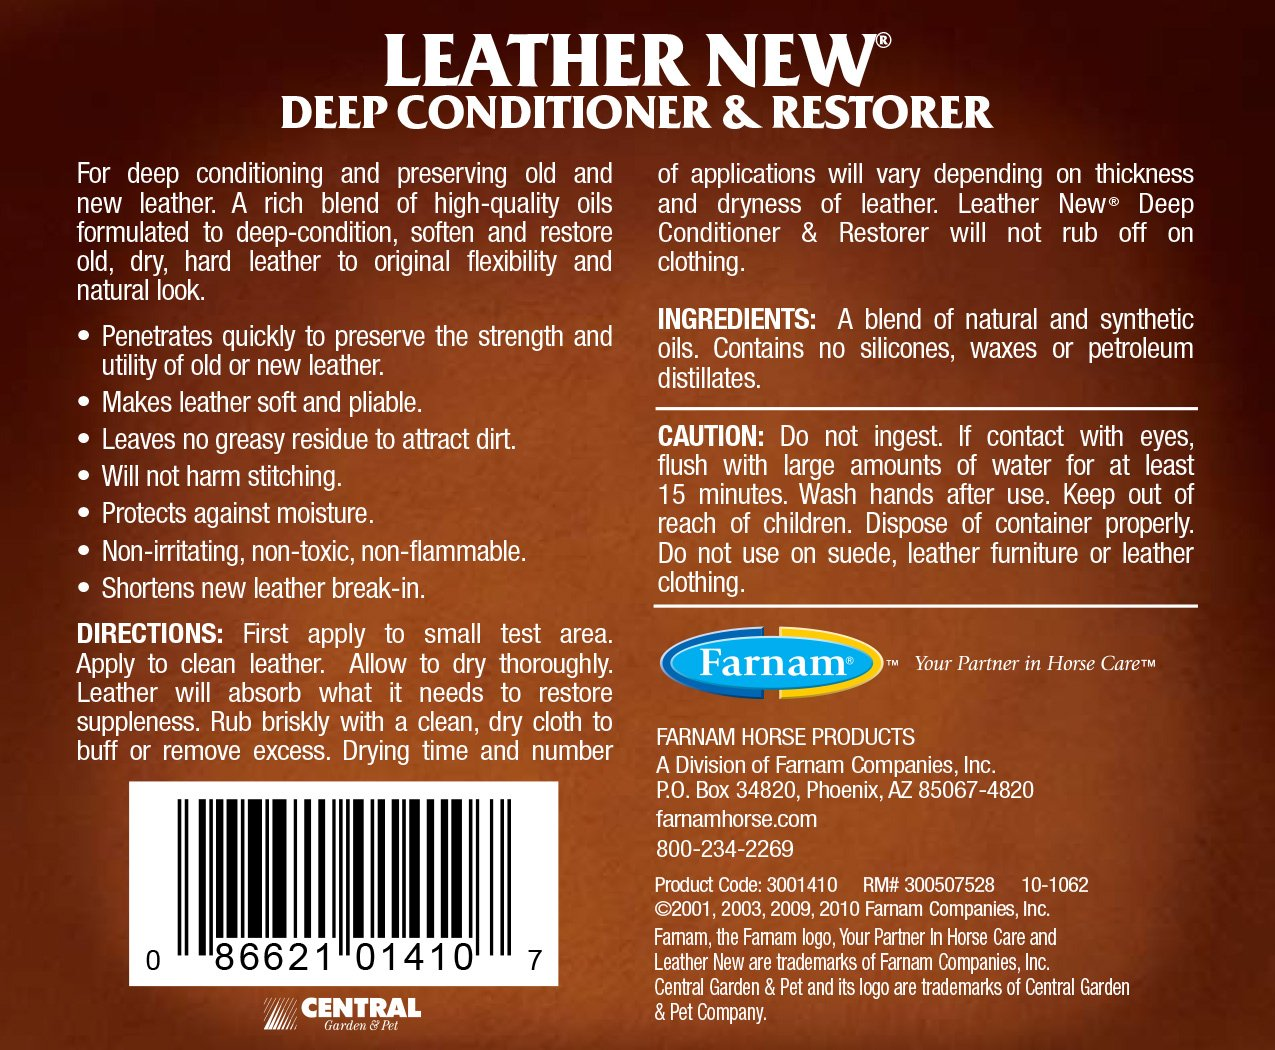 Amazon.com: Farnam Leather New Deep Conditioner, 32 oz: Pet Supplies